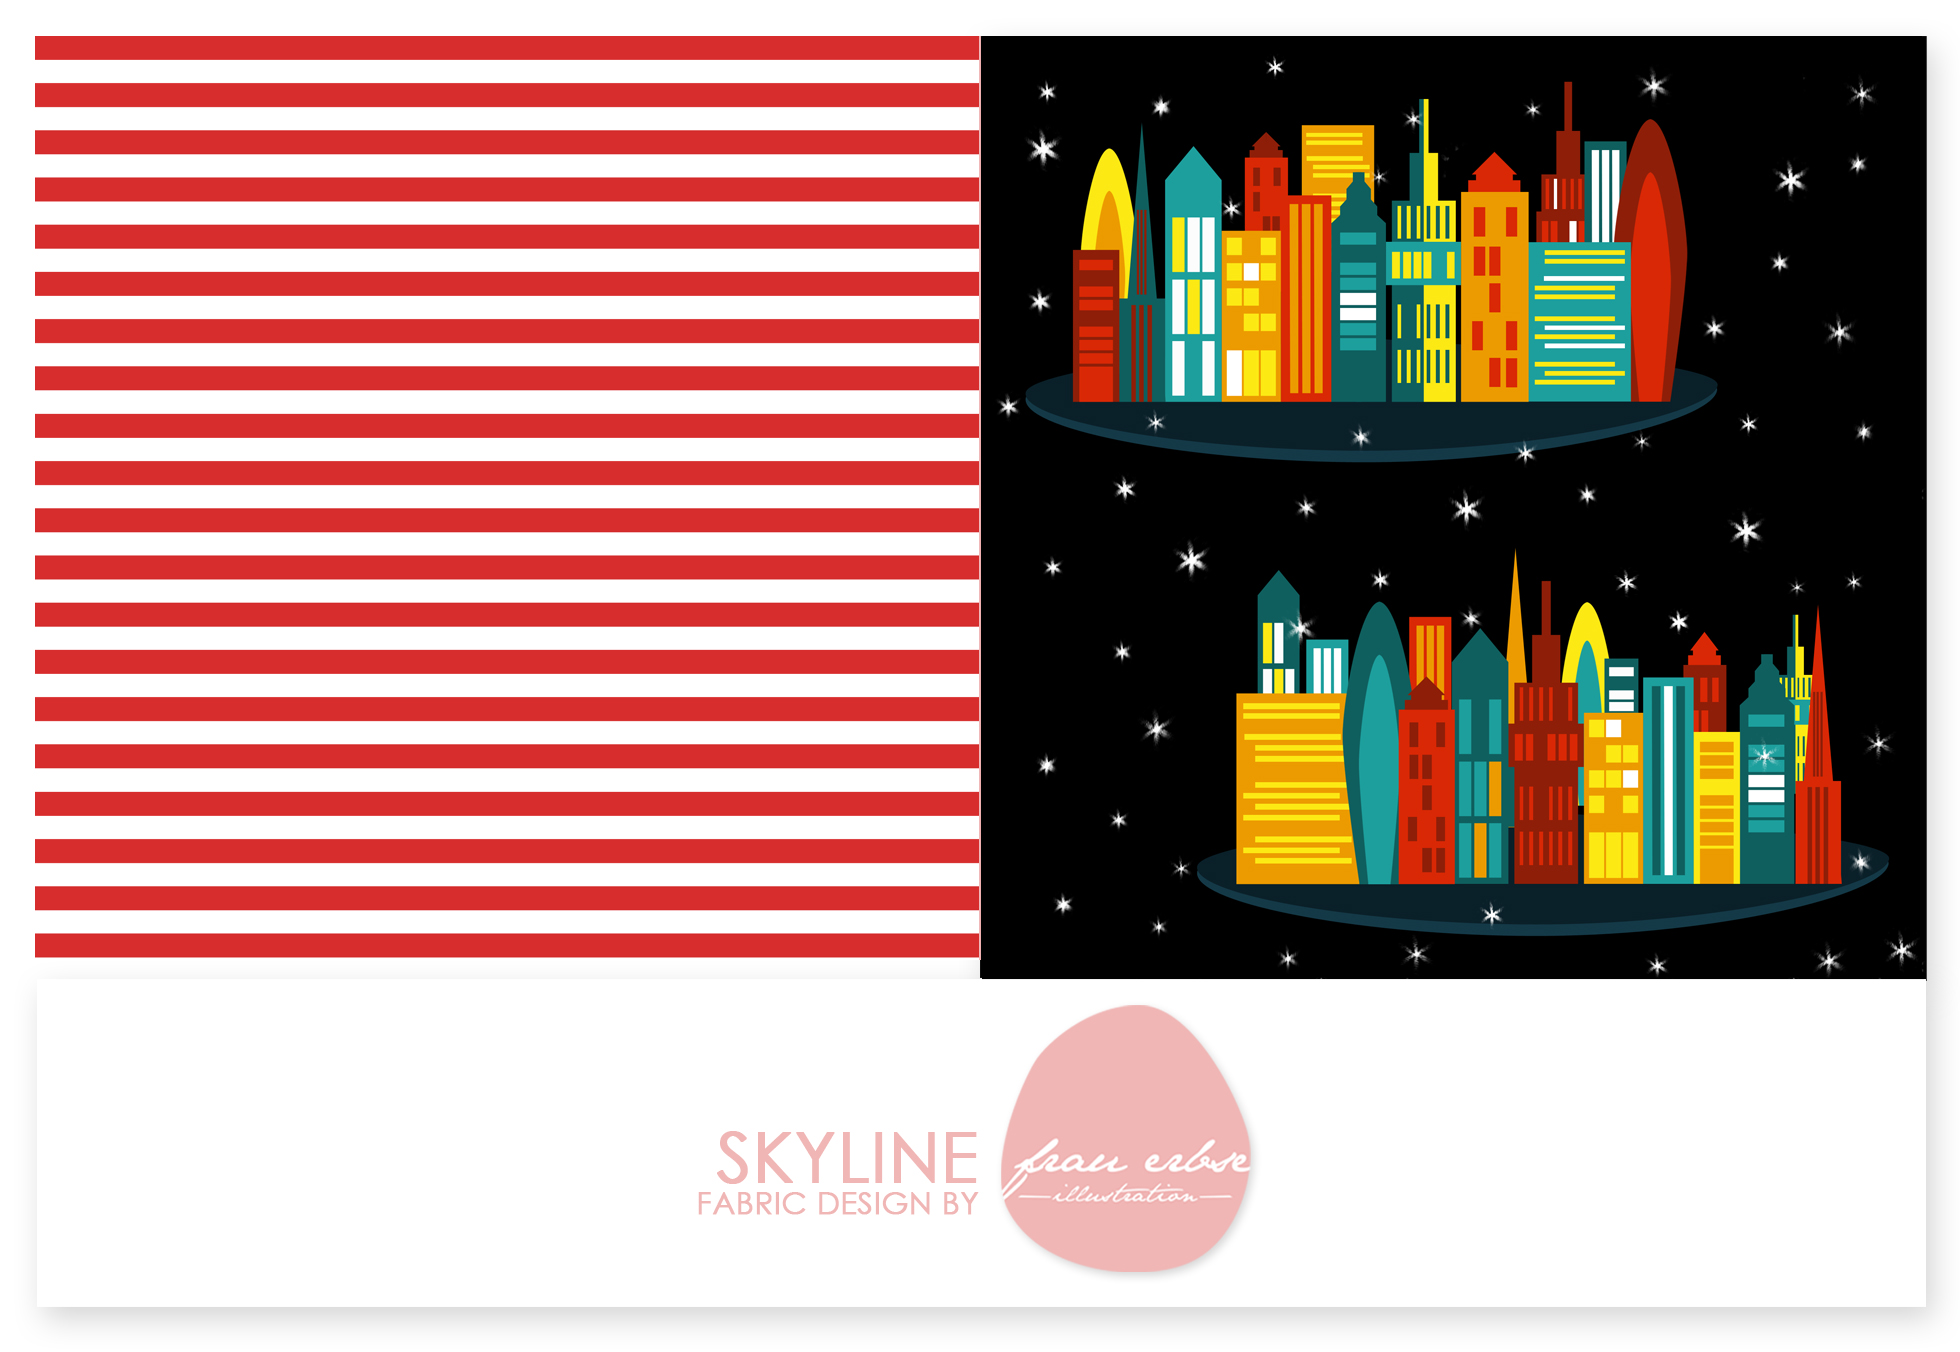 Stoffdesign Skyline